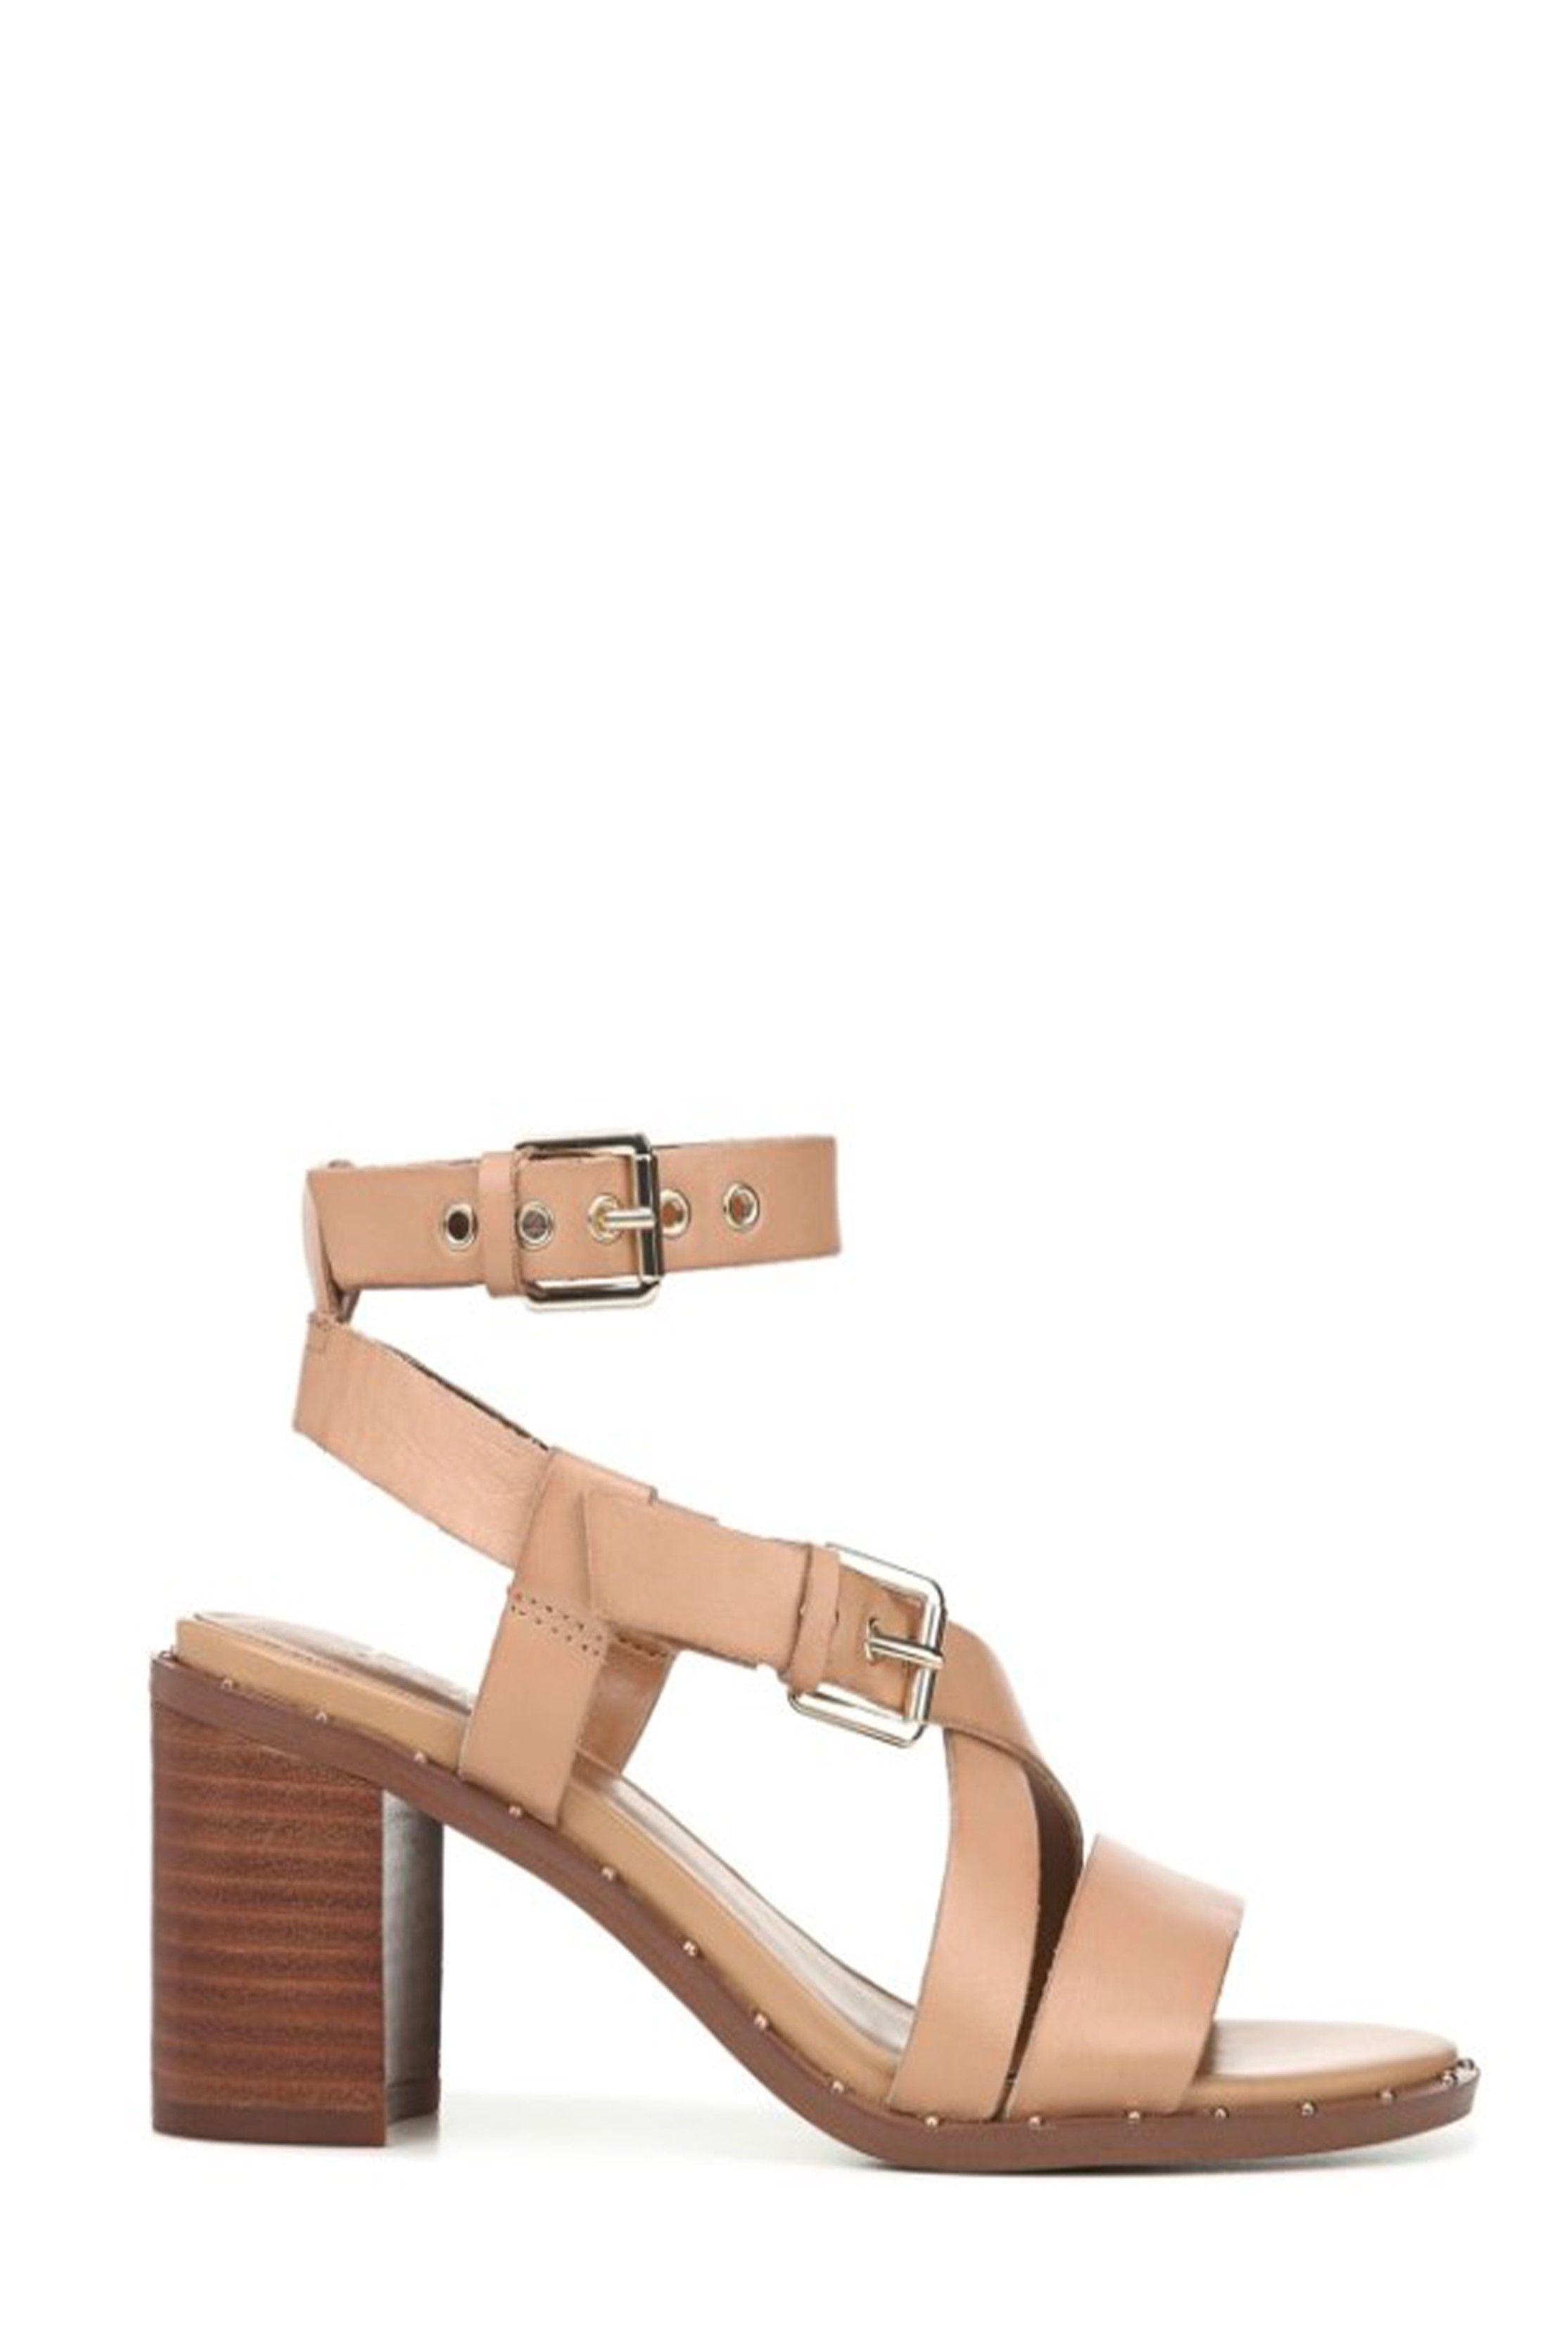 Franco Sarto Halina Chunky Heel Sandals